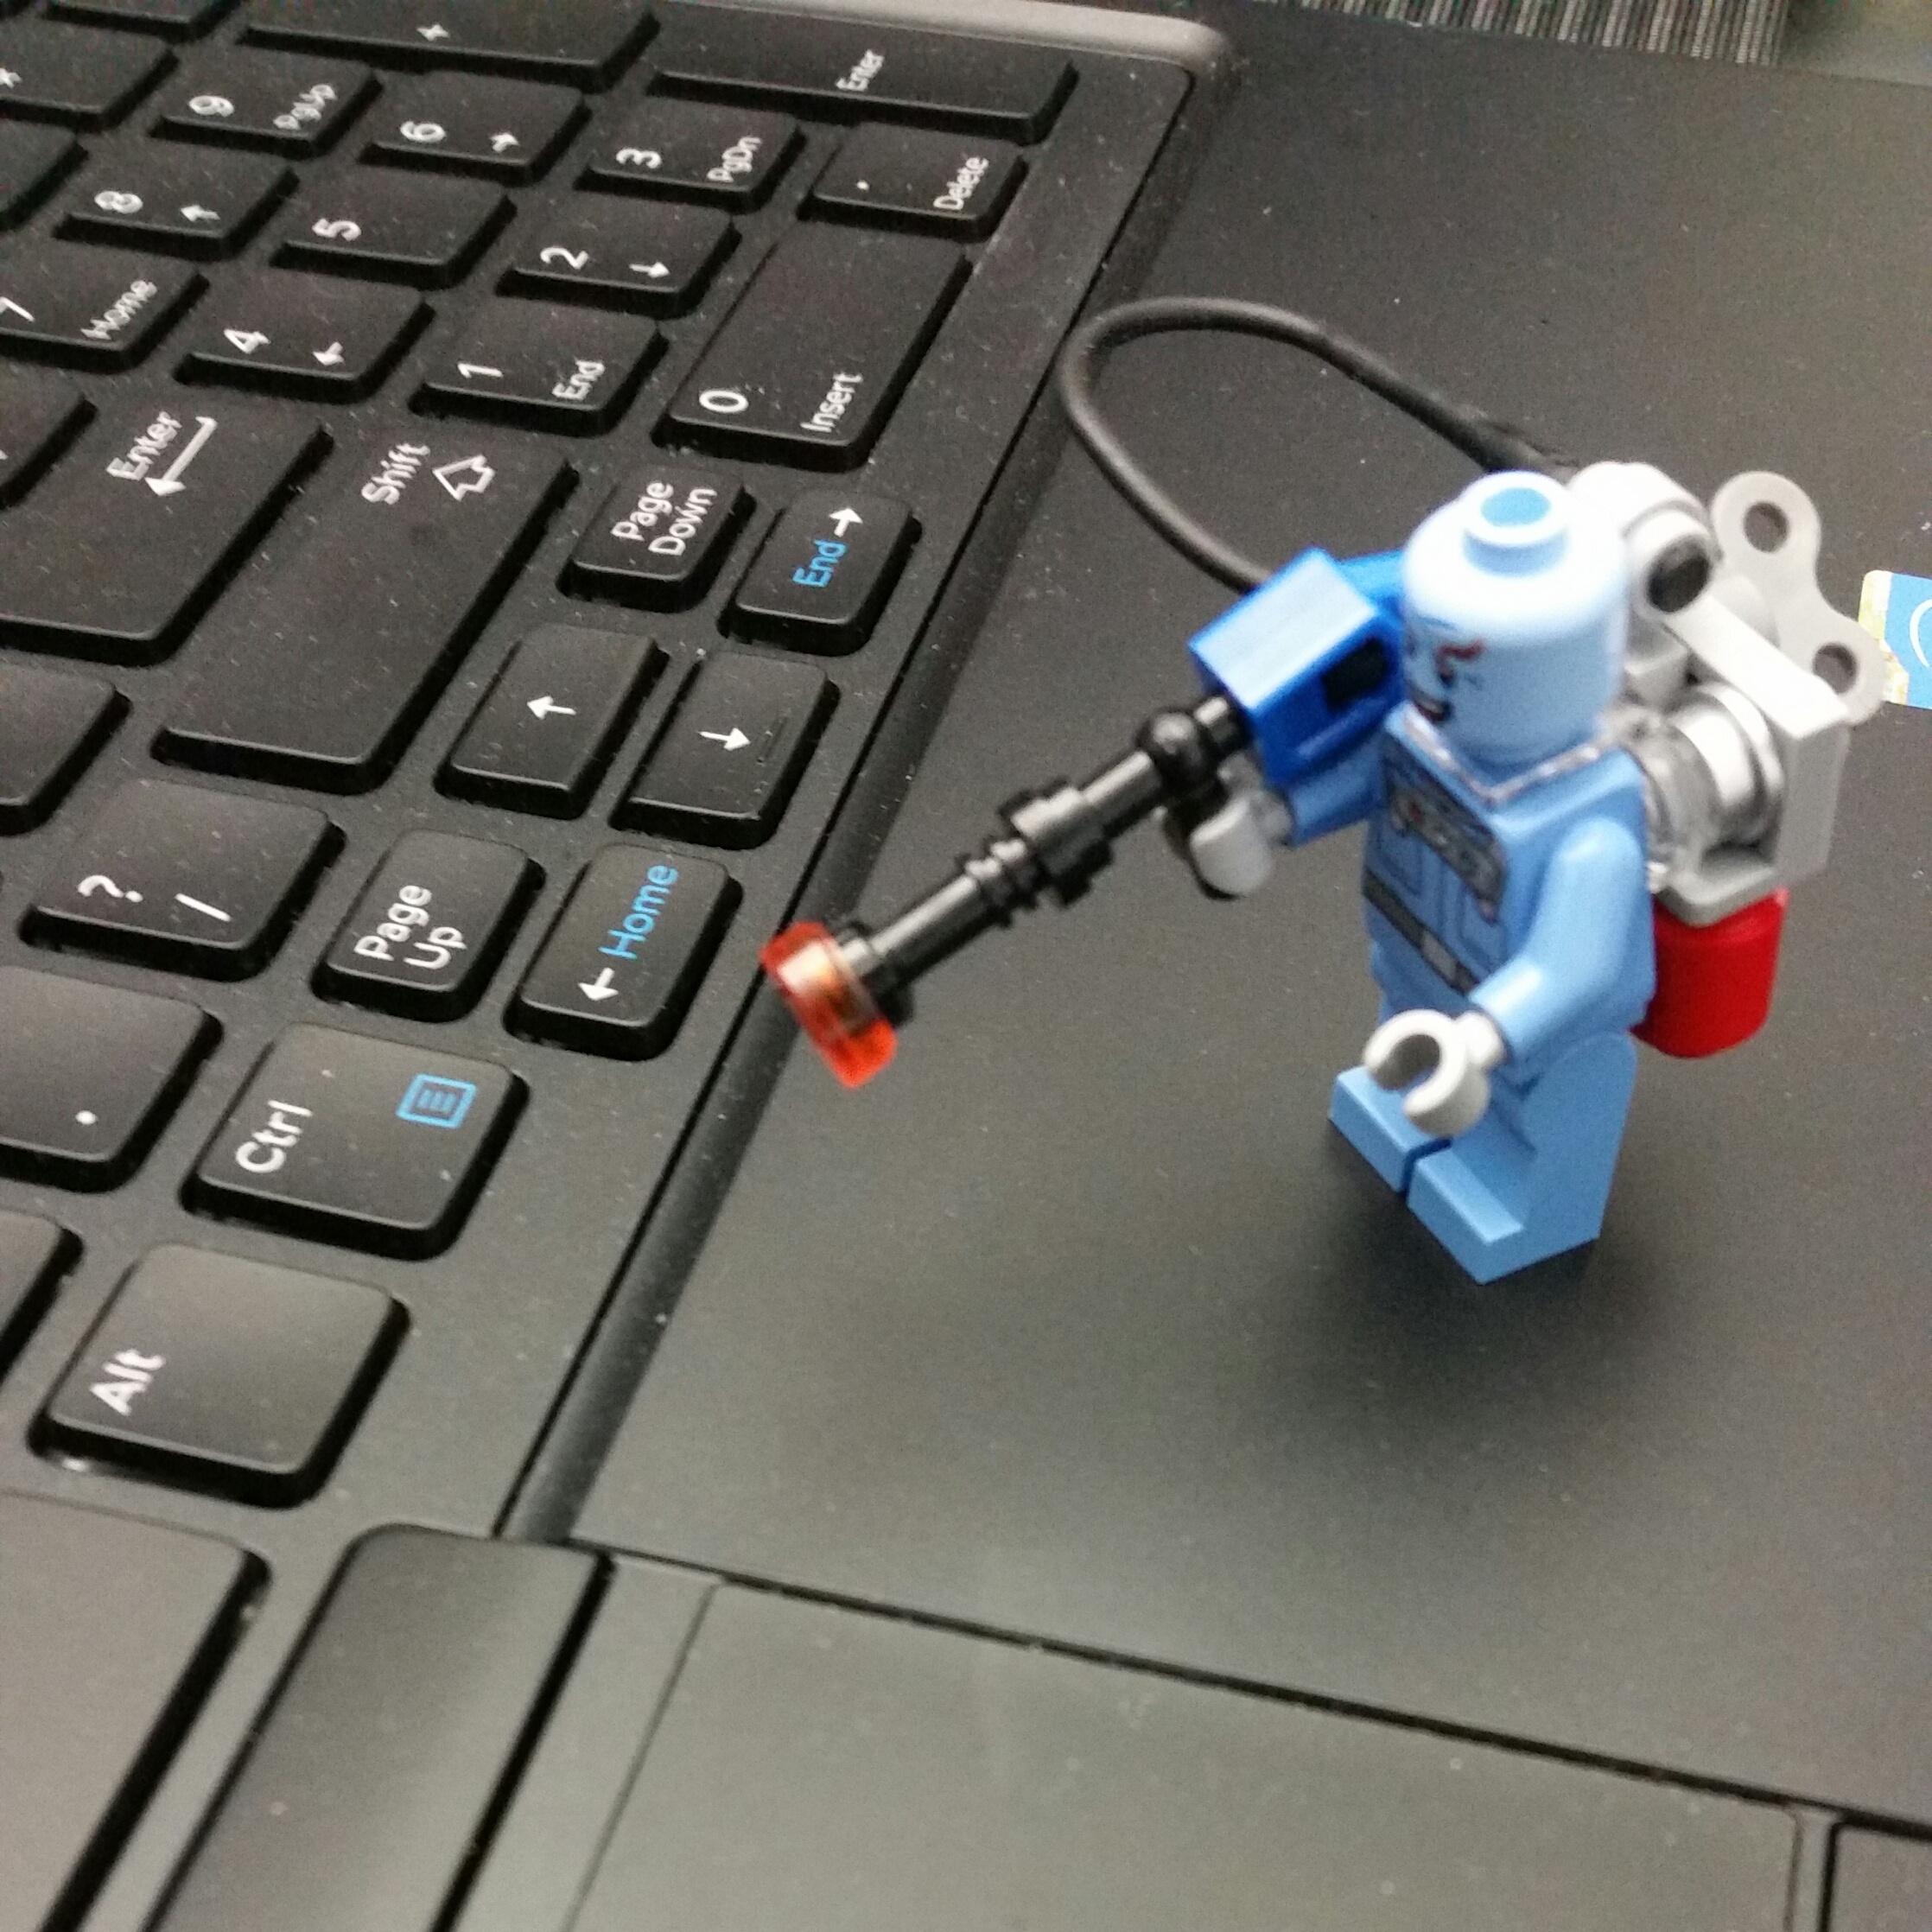 Cybersecurity_keyboard_Lego.jpg